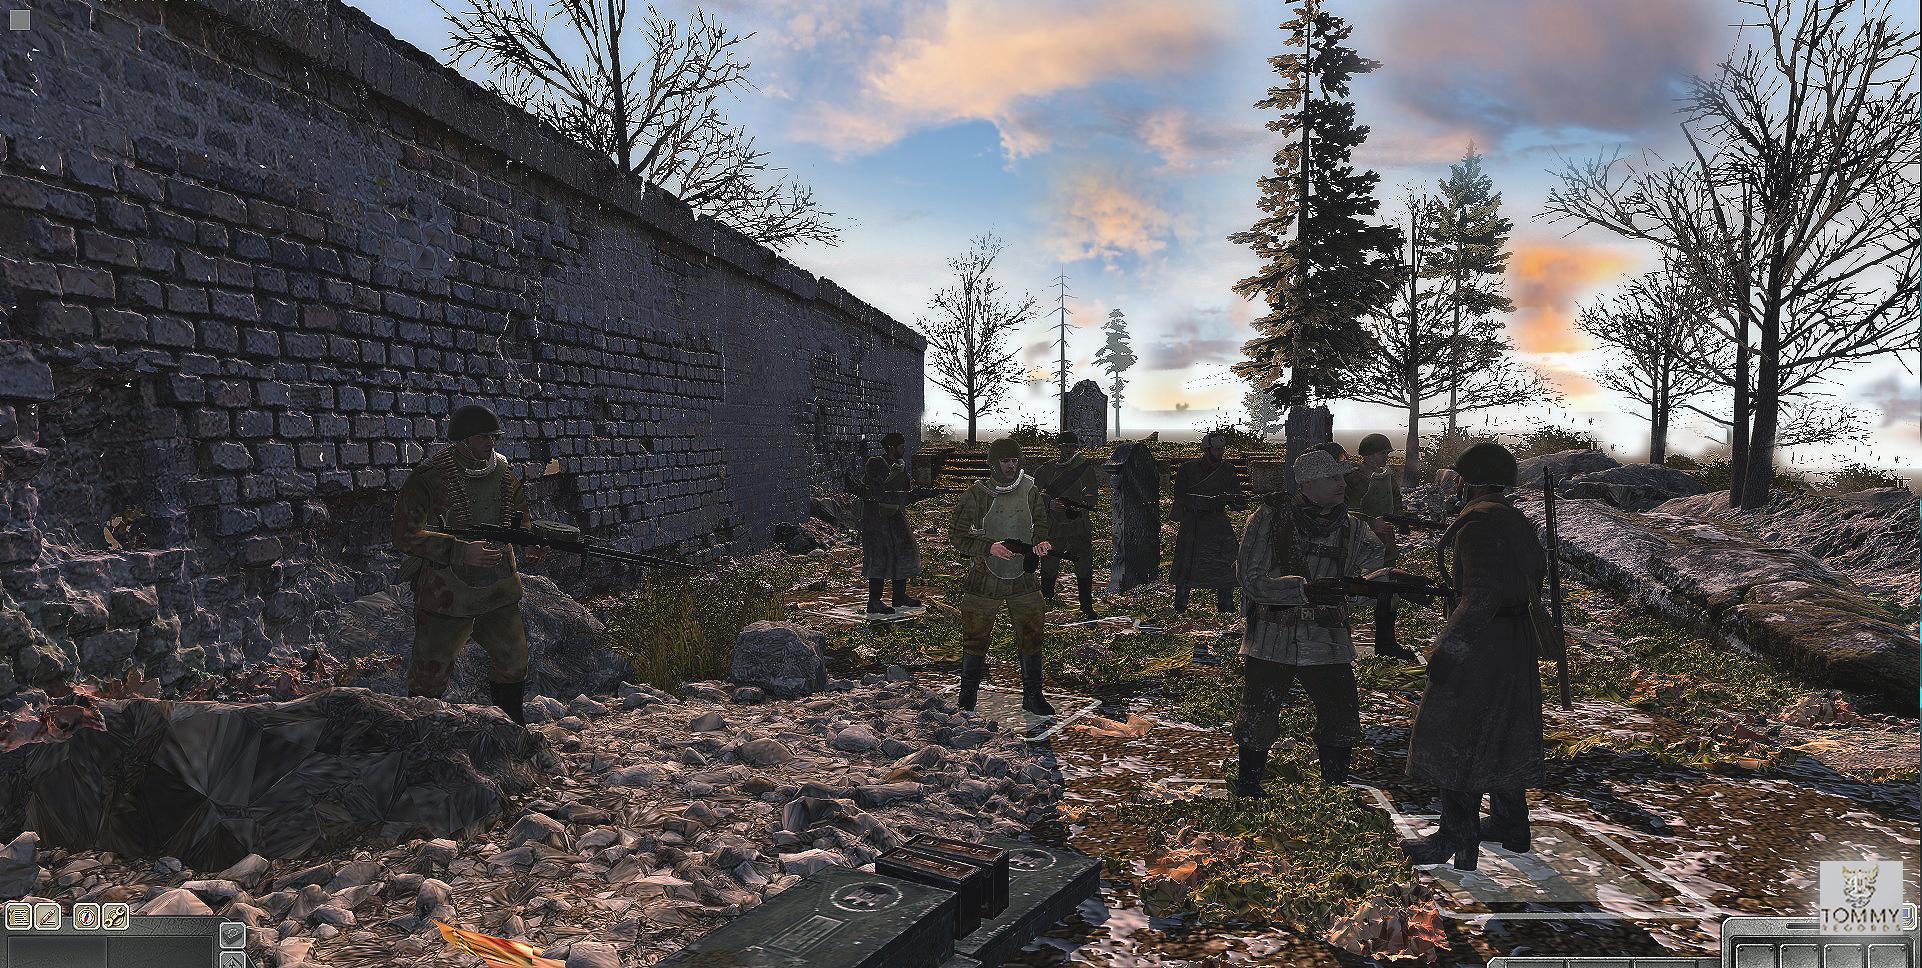 Oroszok egy Budapesti temetben